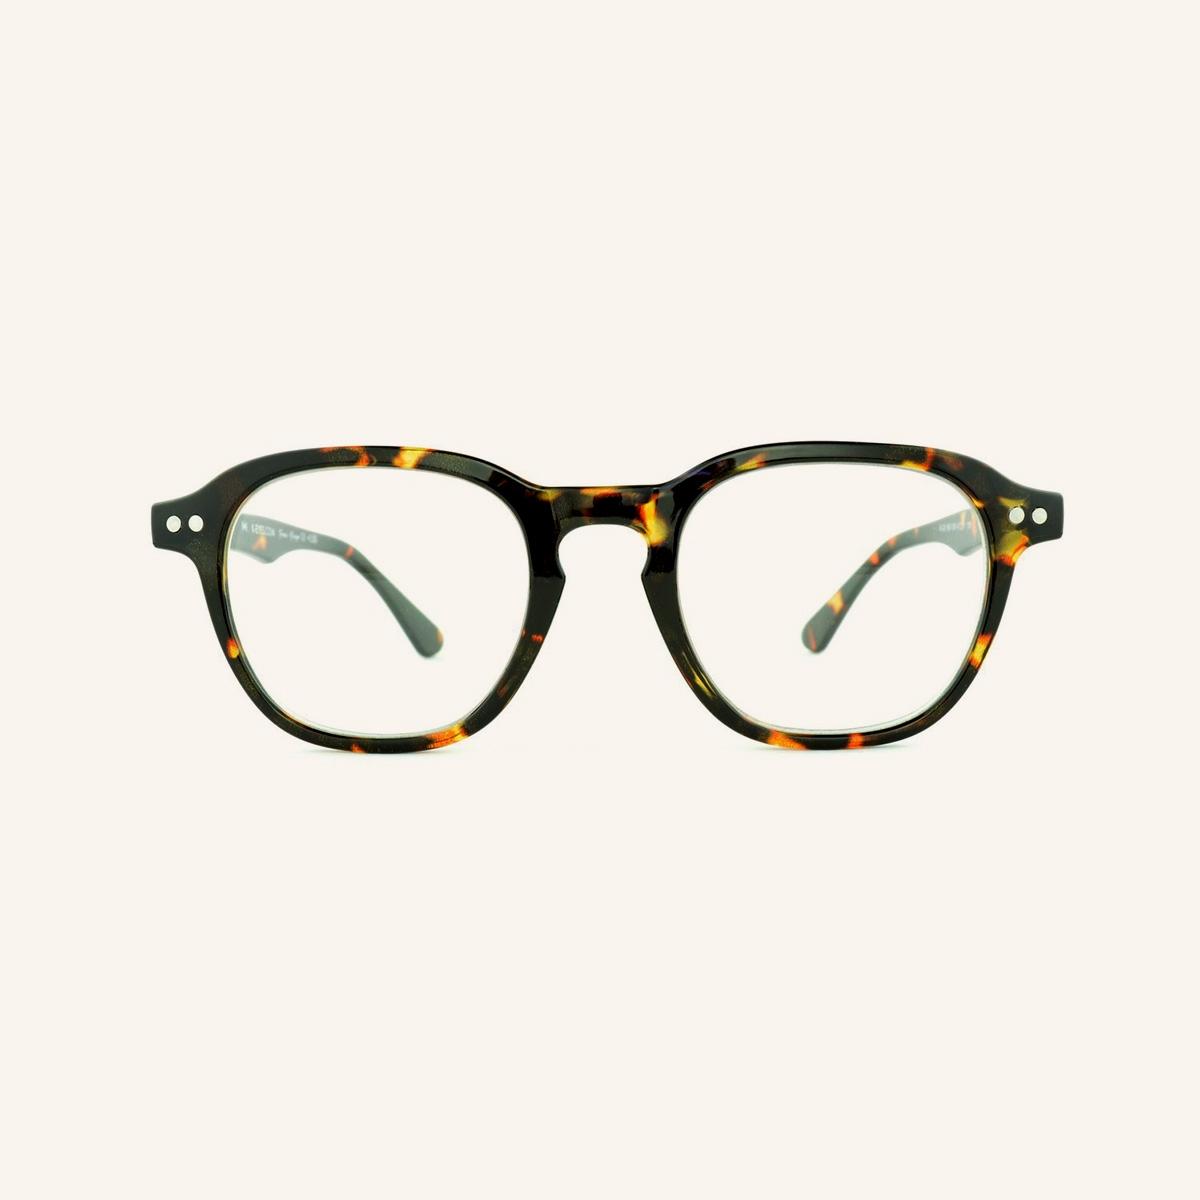 Squared reading glasses Clark